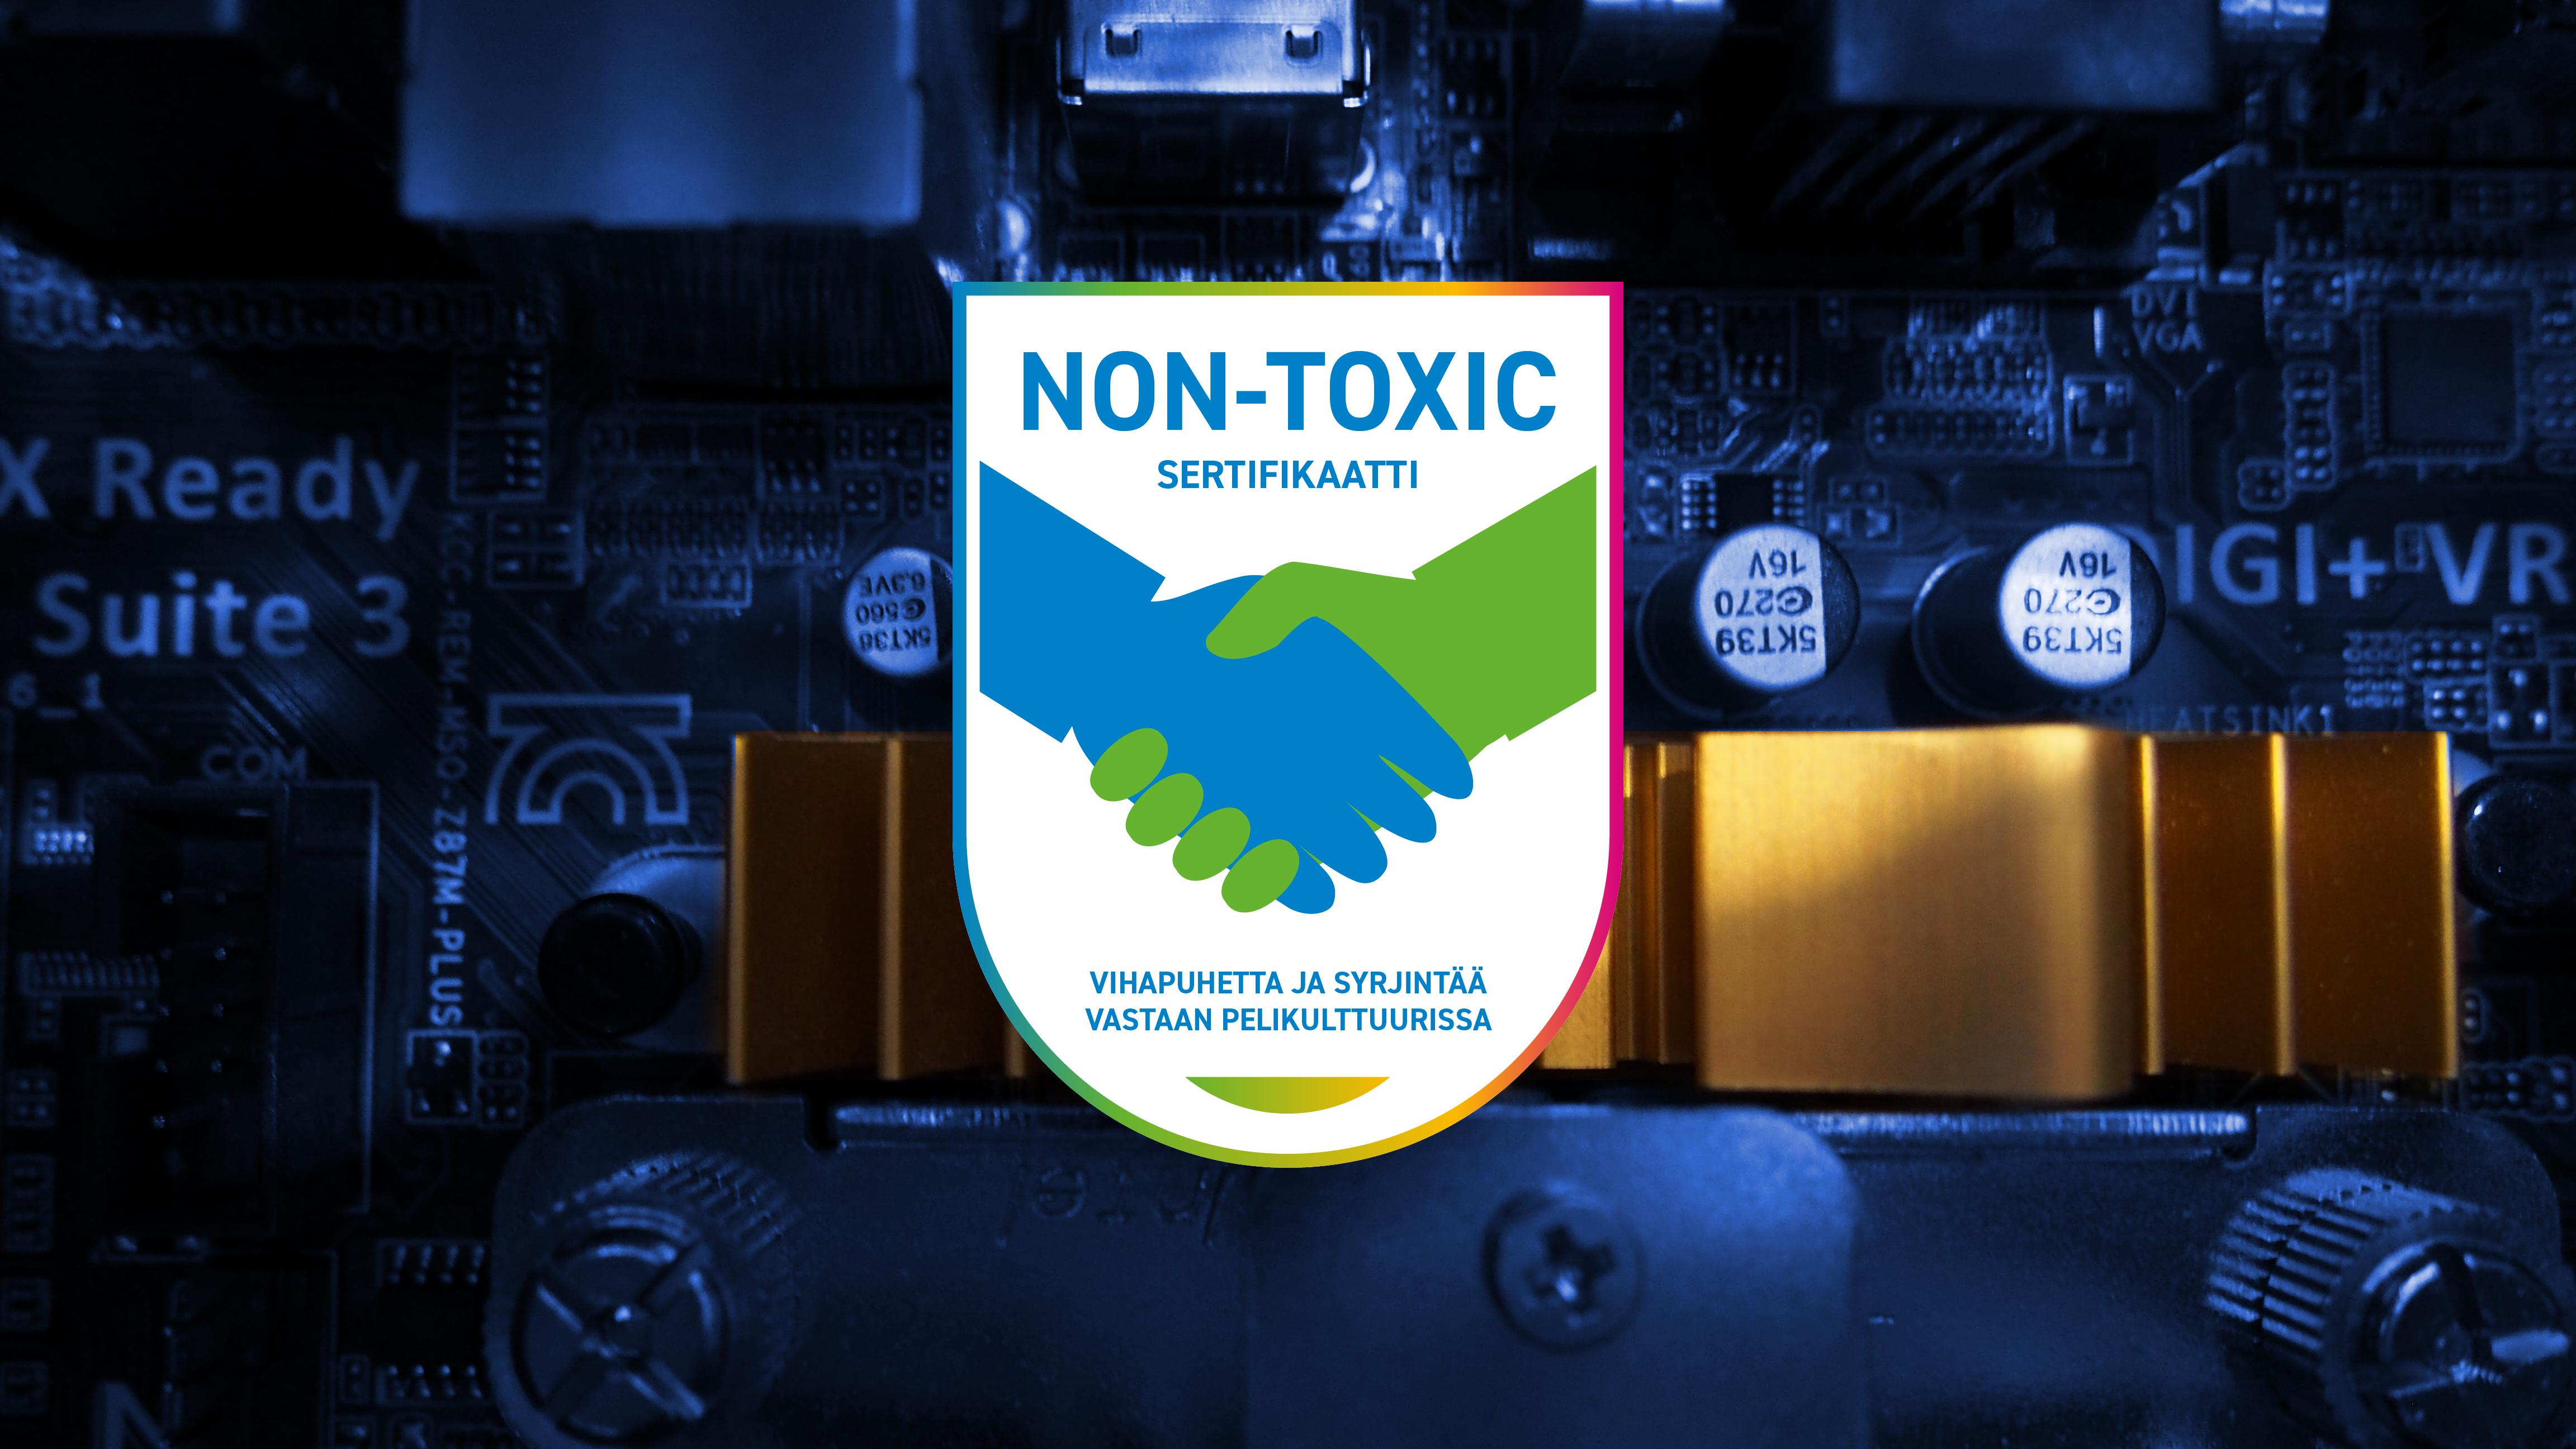 Non-toxic sertifikaatti